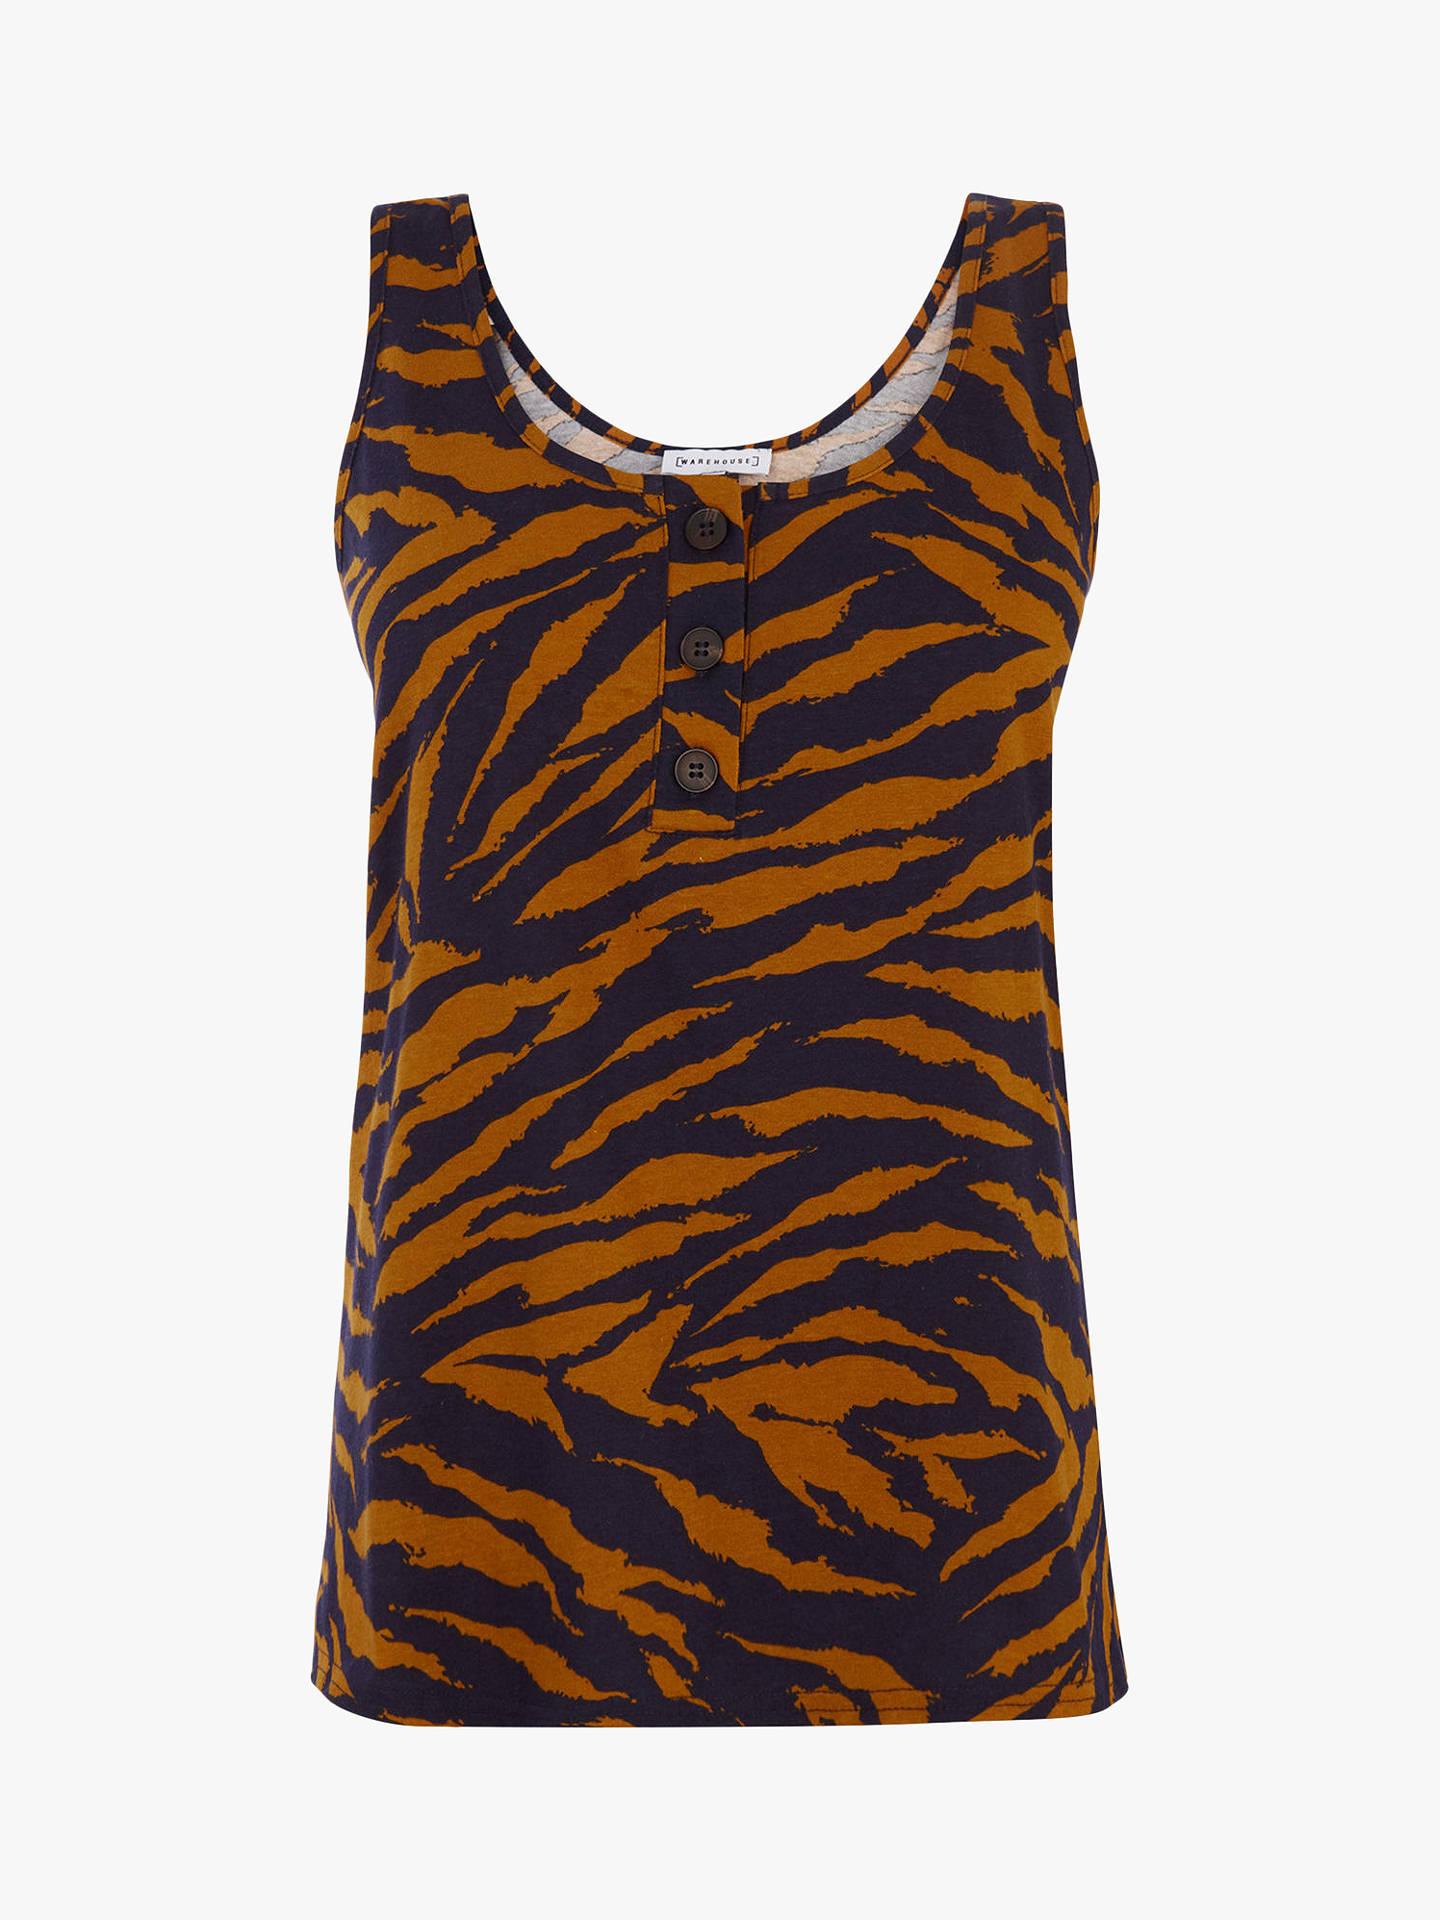 6954d3568ea4e7 ... Buy Warehouse Tiger Print Vest Top, Multi, 10 Online at johnlewis.com  ...